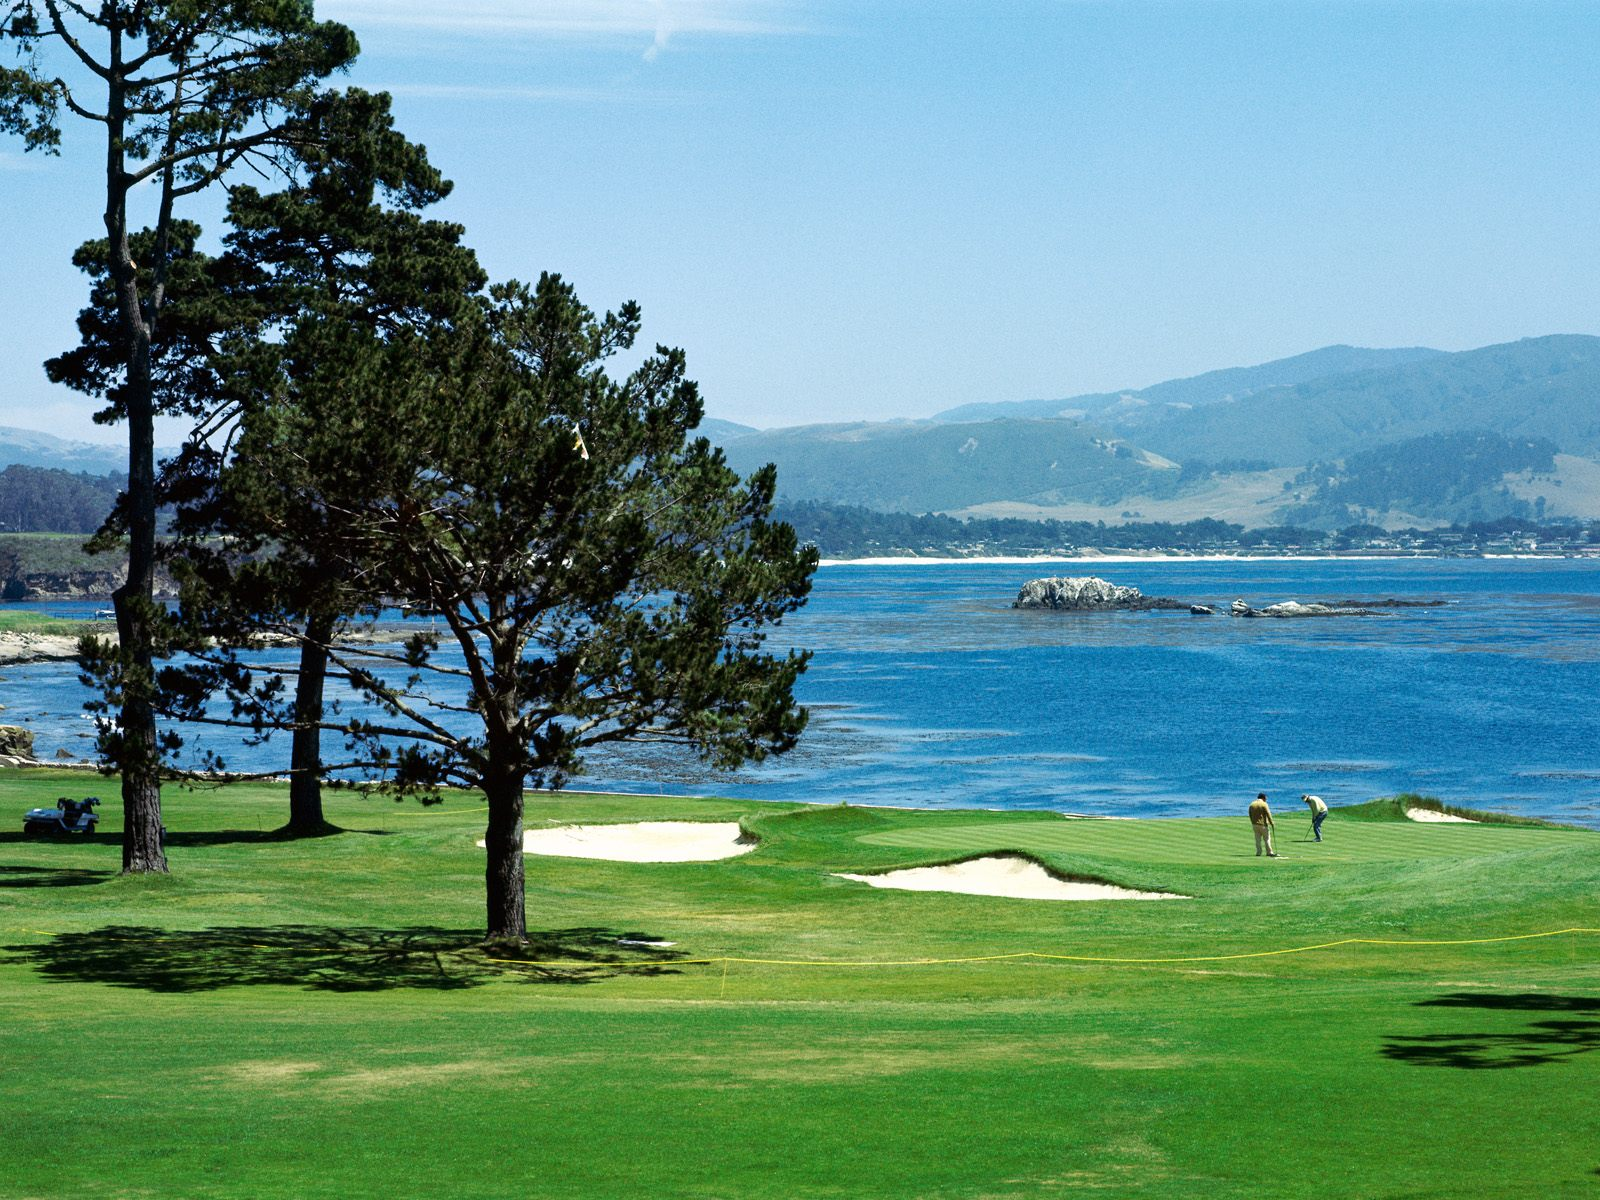 Pebble Beach California   Sports Photography Desktop Wallpapers 6648 1600x1200